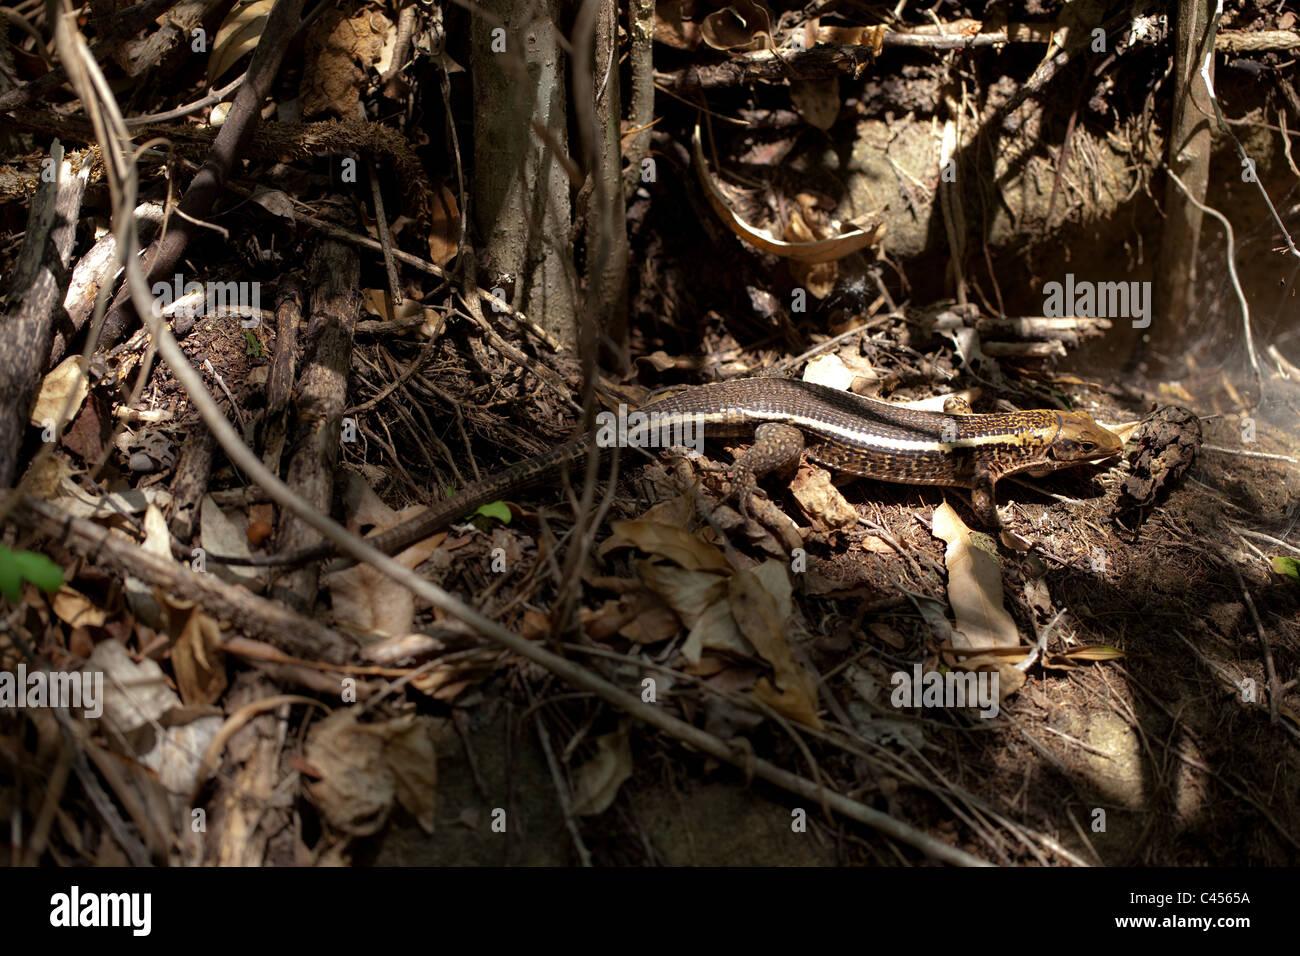 Madagascar Plated Lizard (Zonosaurus madagascariensis). Ranomafana. Forest floor in dappled lighting conditions. - Stock Image